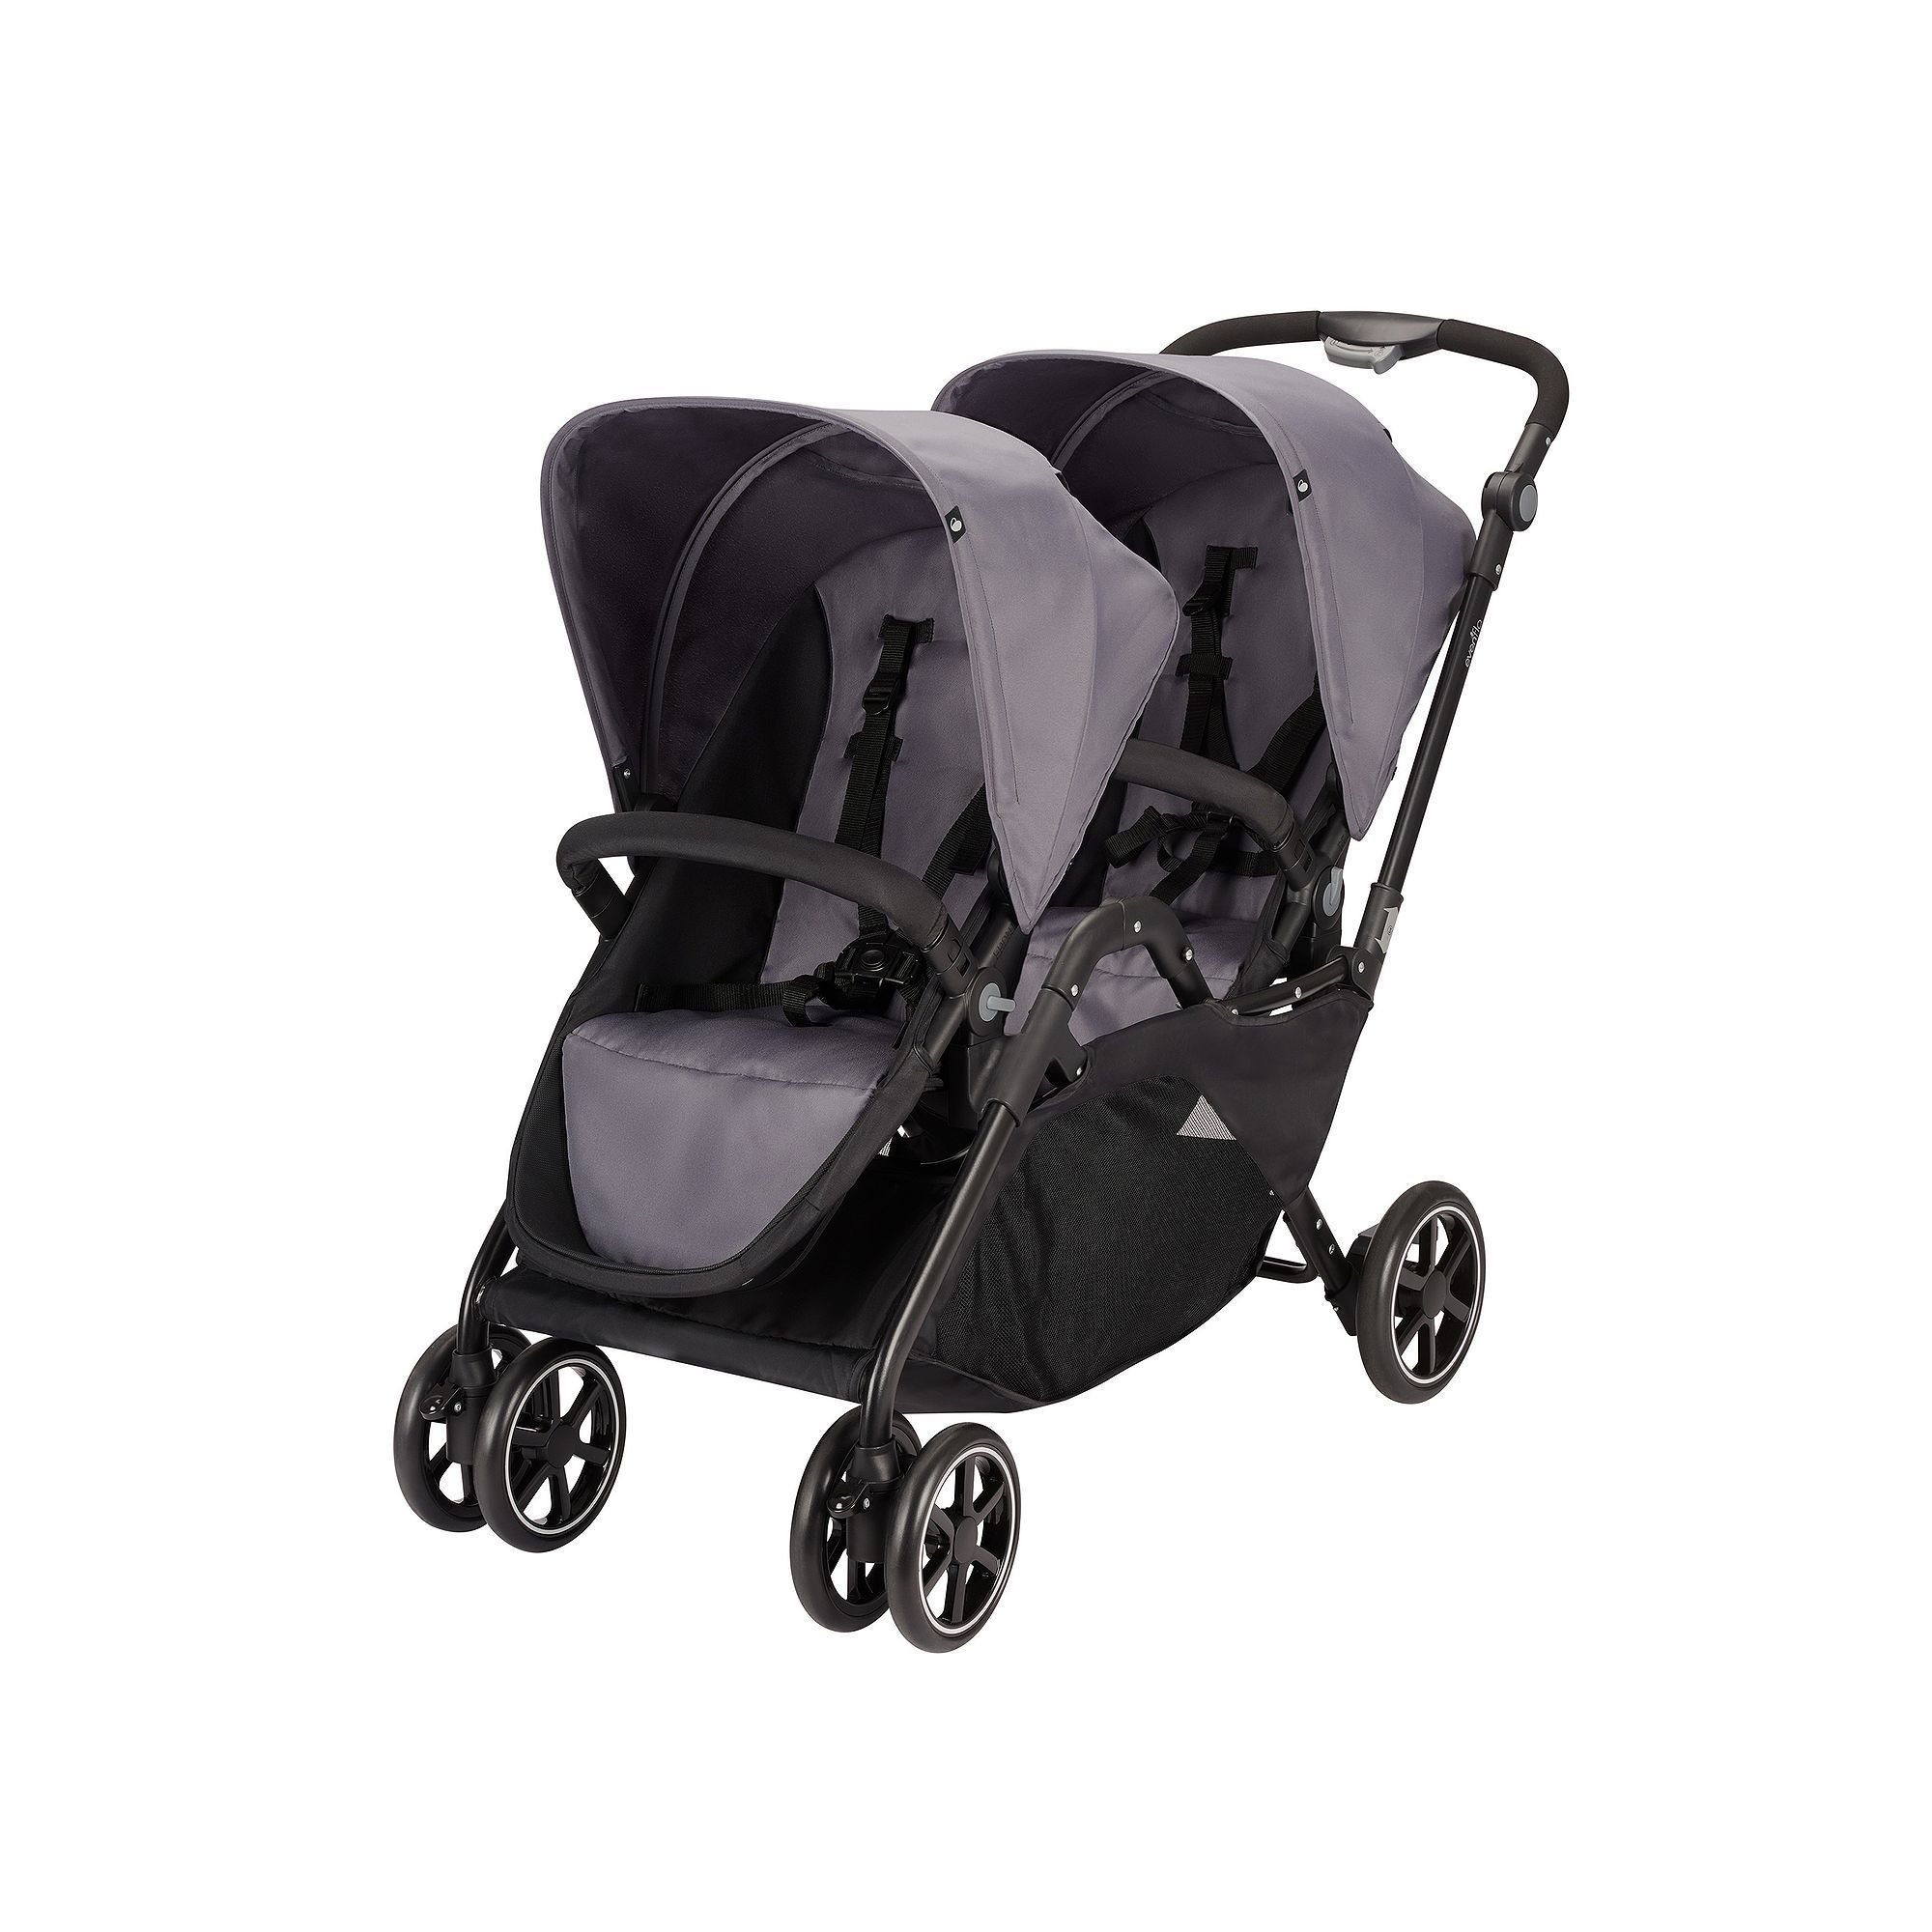 evenflo parallel tandem double stroller grey  double strollers  - evenflo parallel tandem double stroller grey